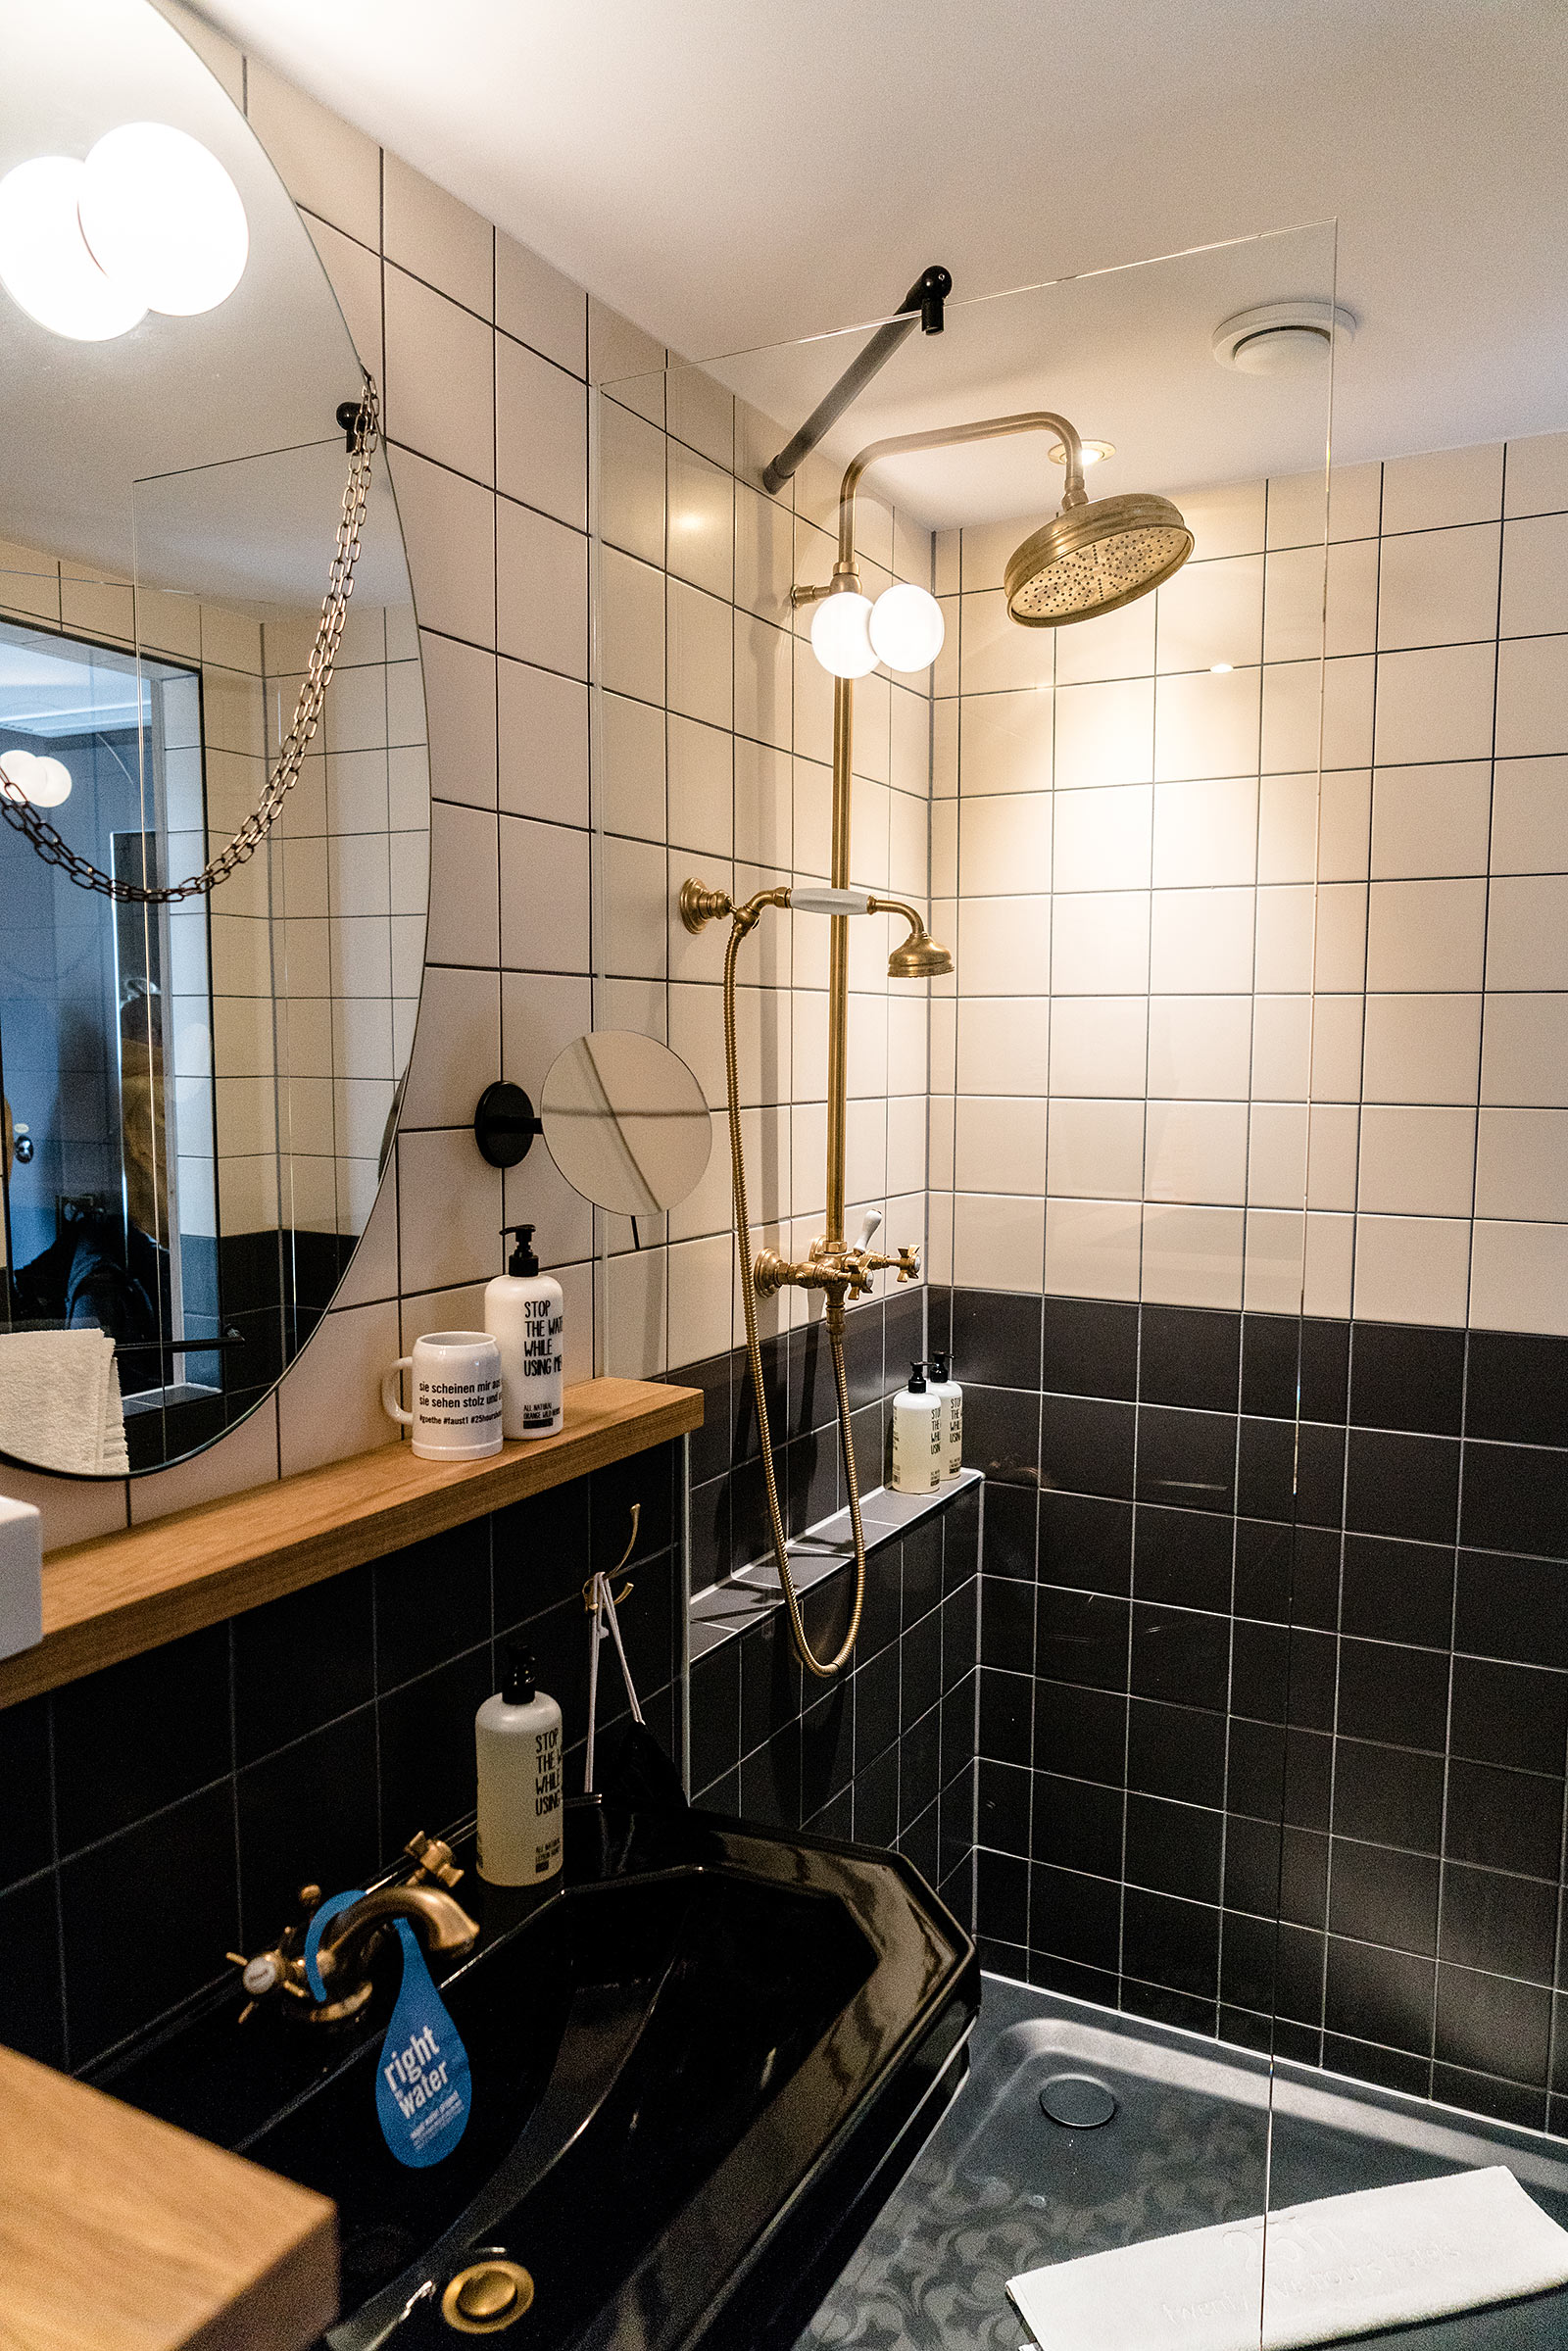 25hours hotel münchen the royal bavarian bad travel blog sunnyinga